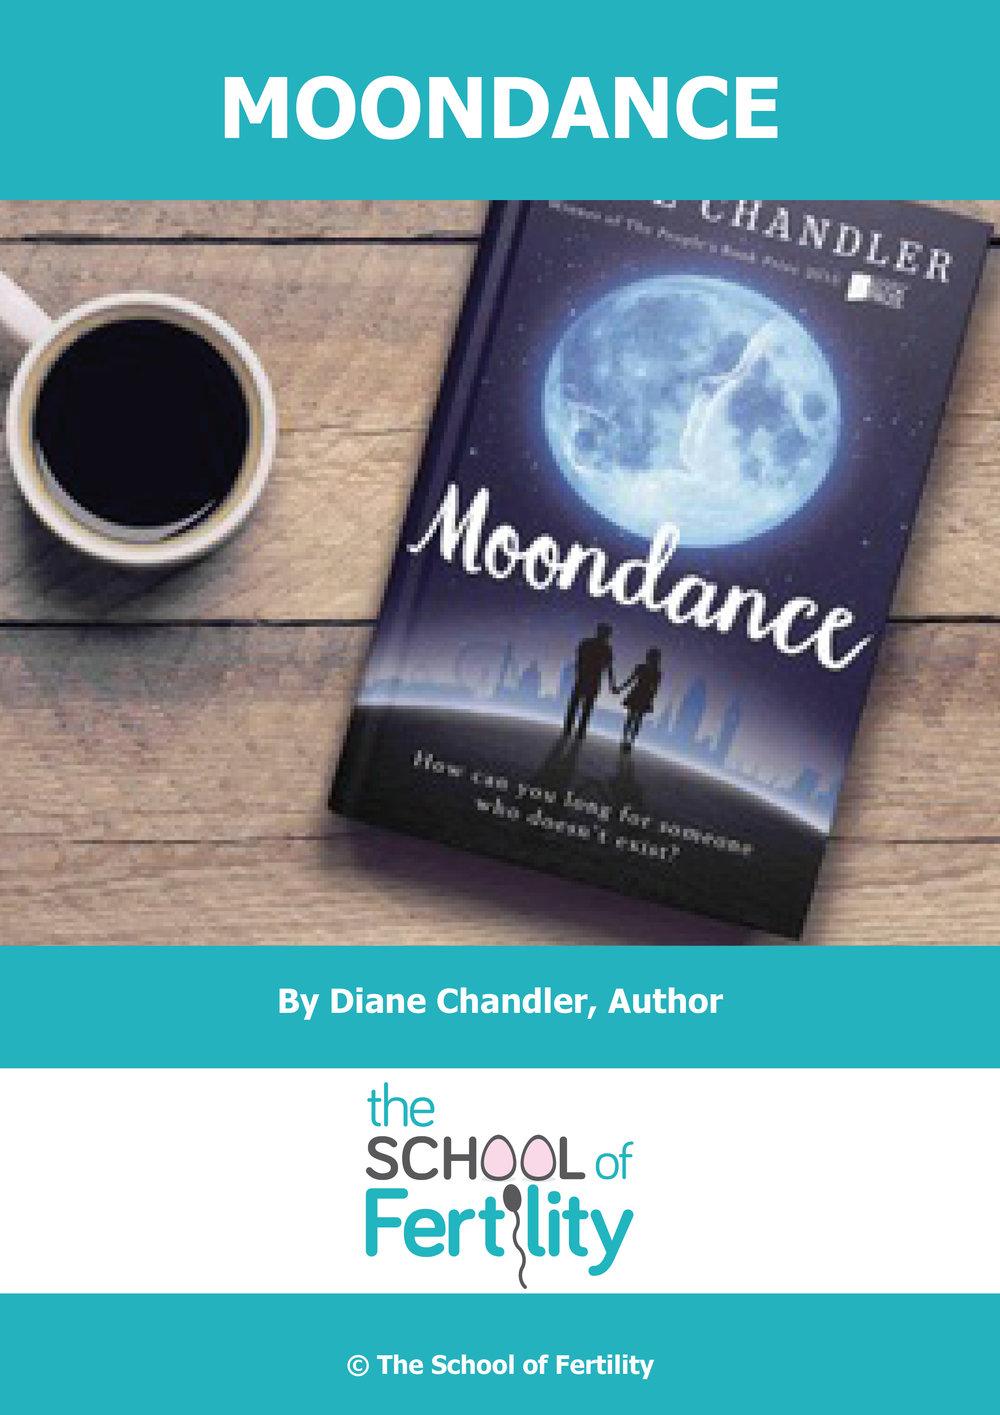 Moondance (c) The School of Fertility